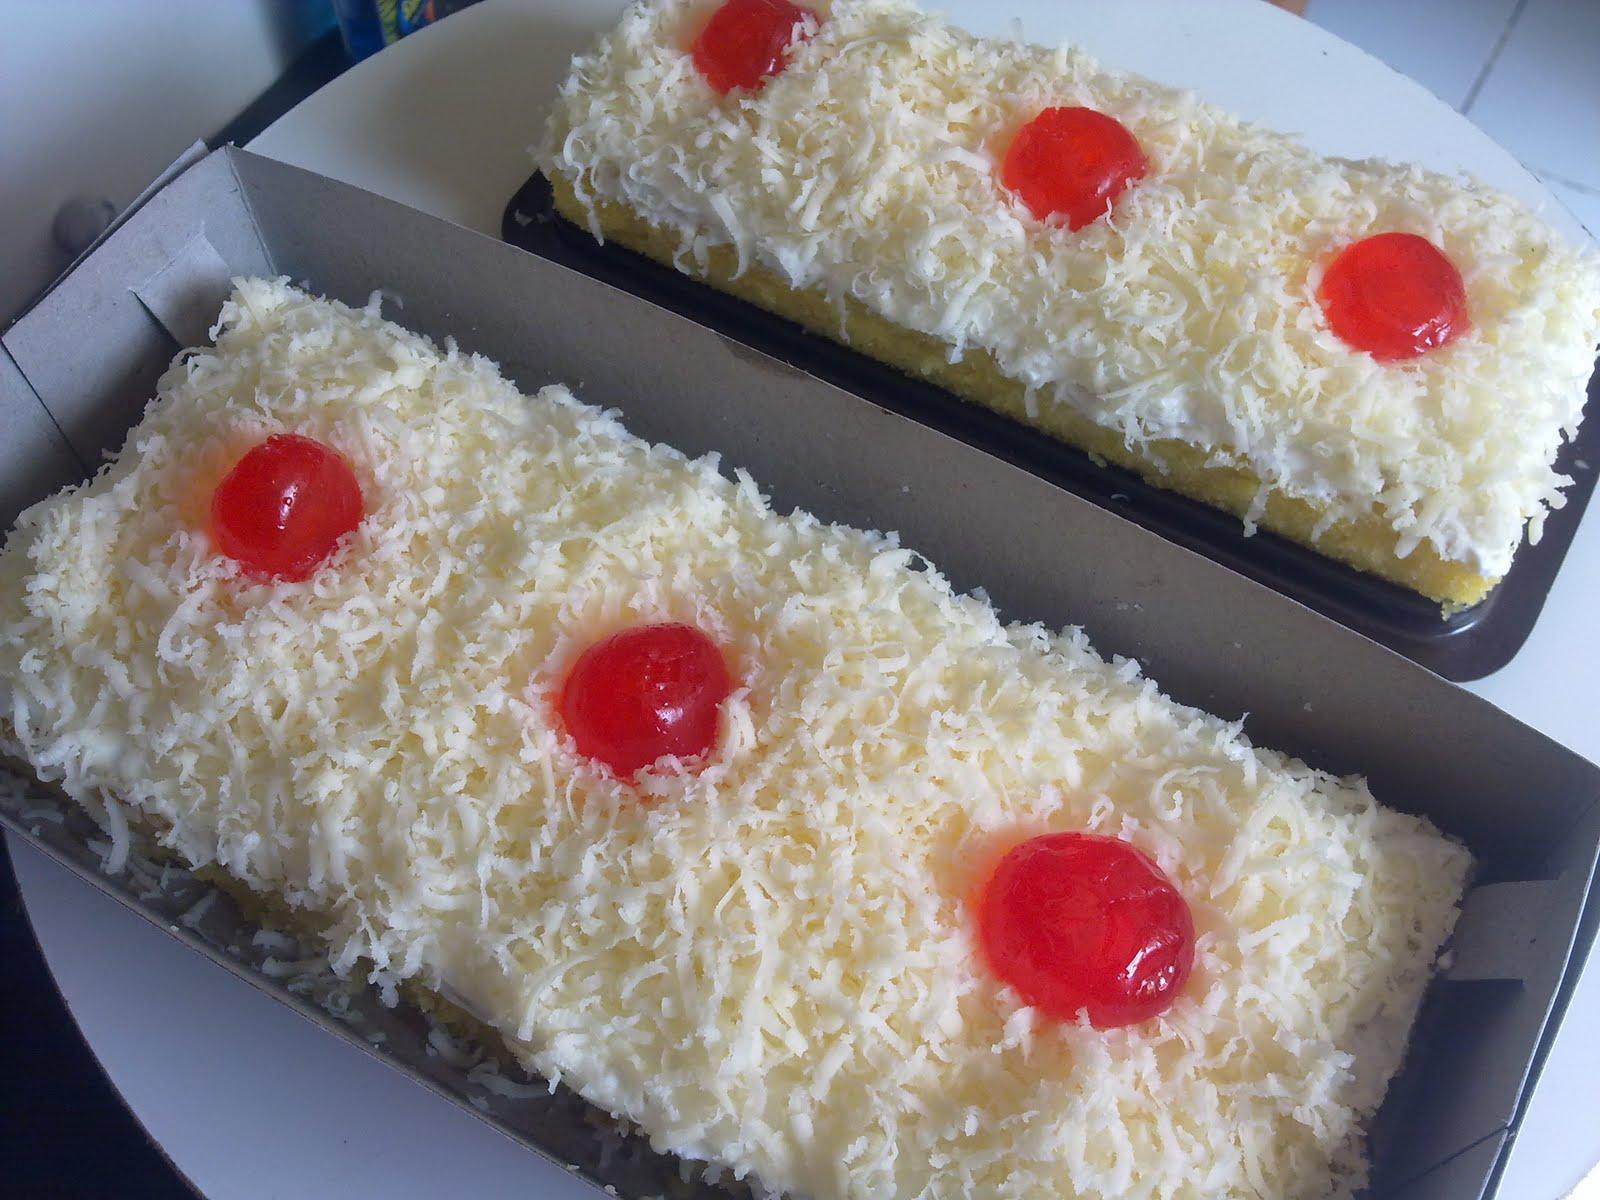 Resep Cake Kukus Keju Coklat: Cake Keju Kukus